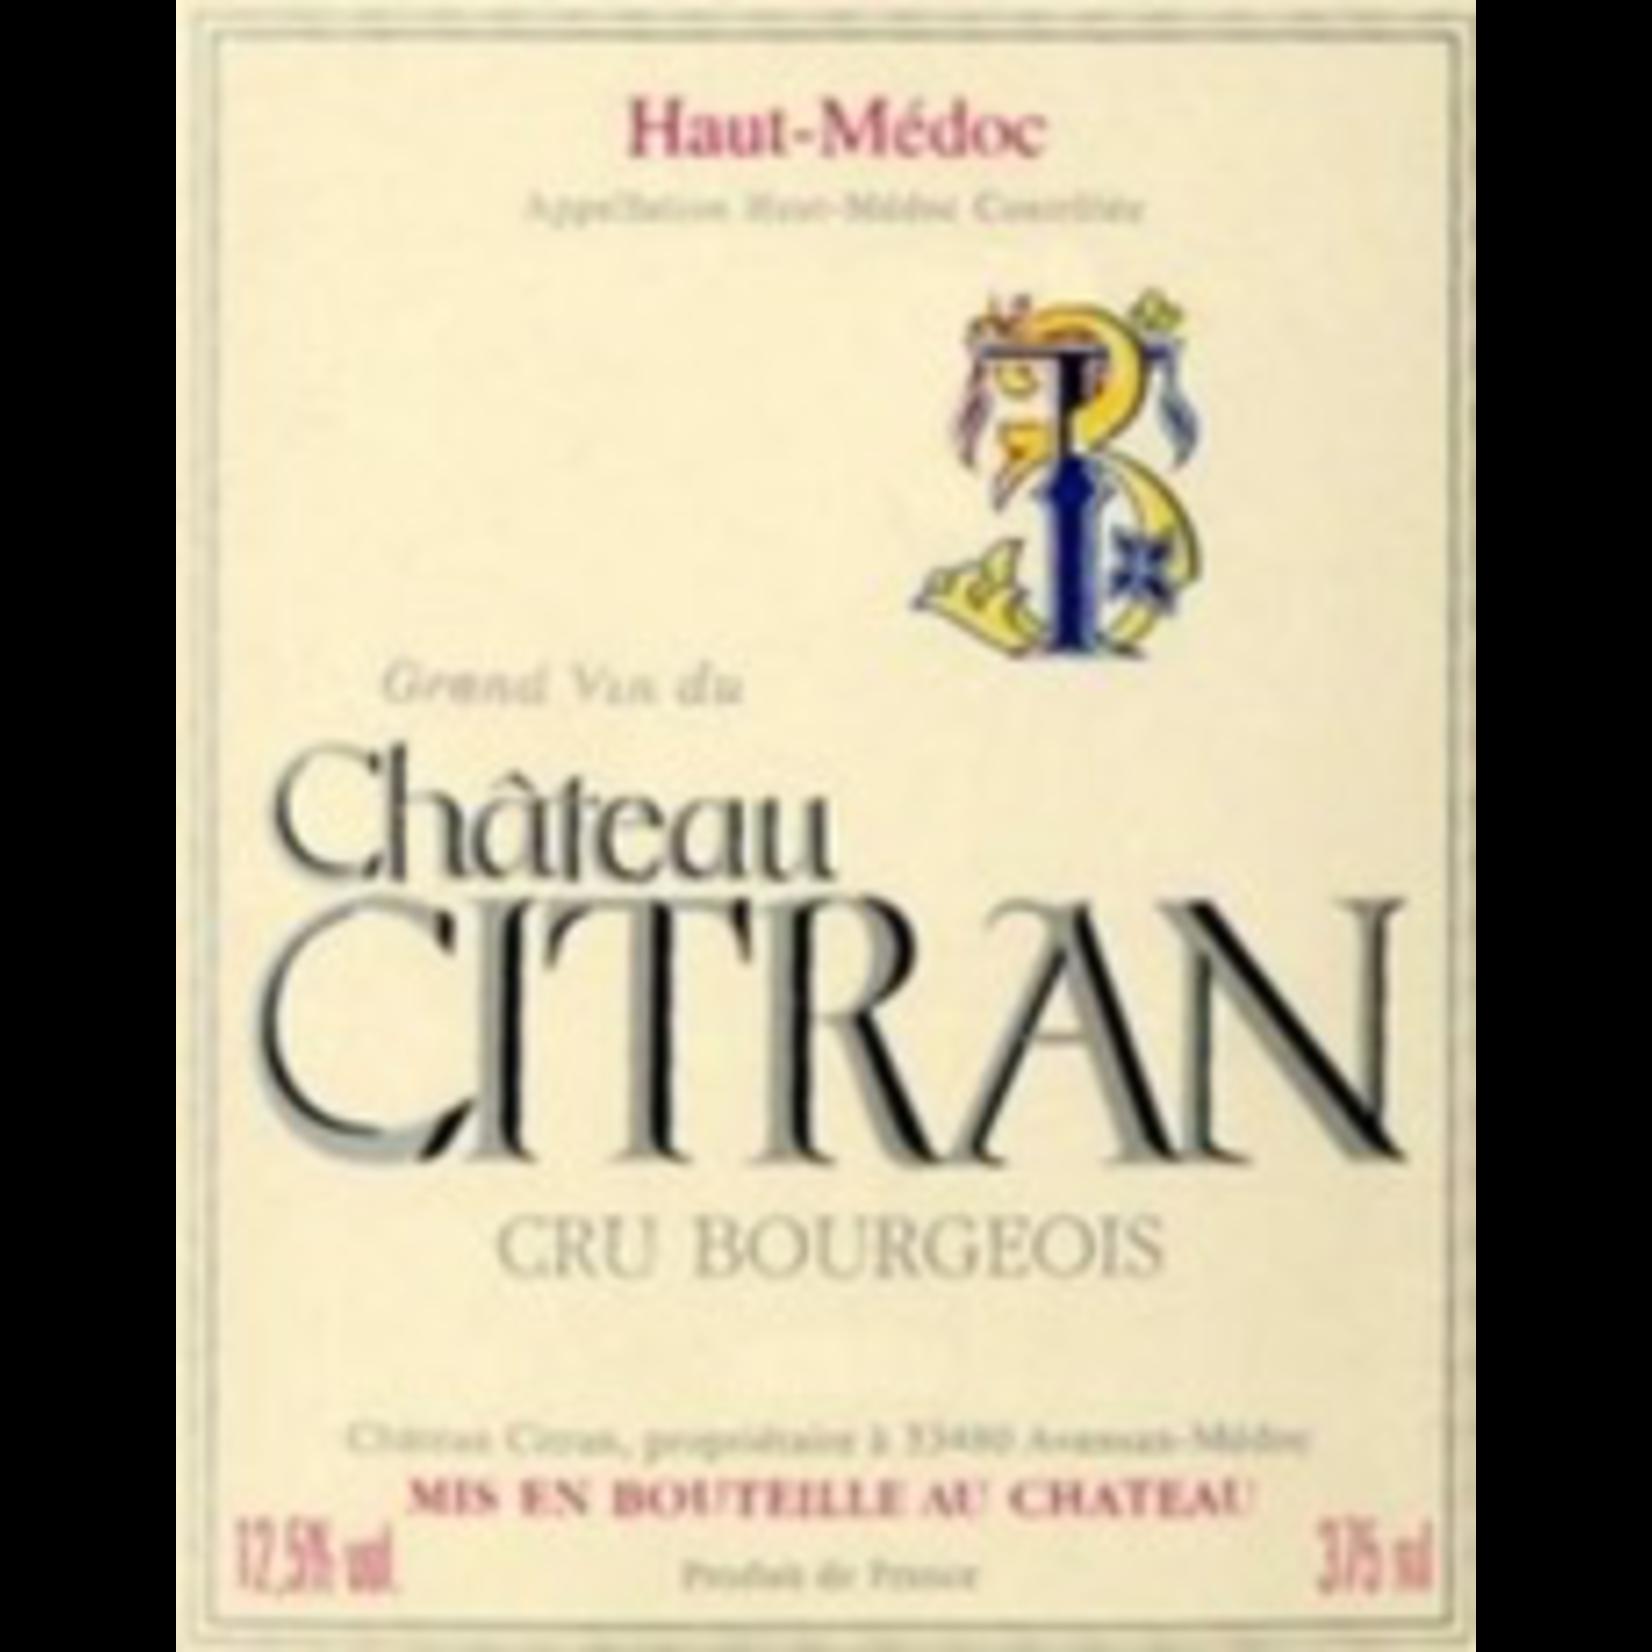 Ch Citran 2018